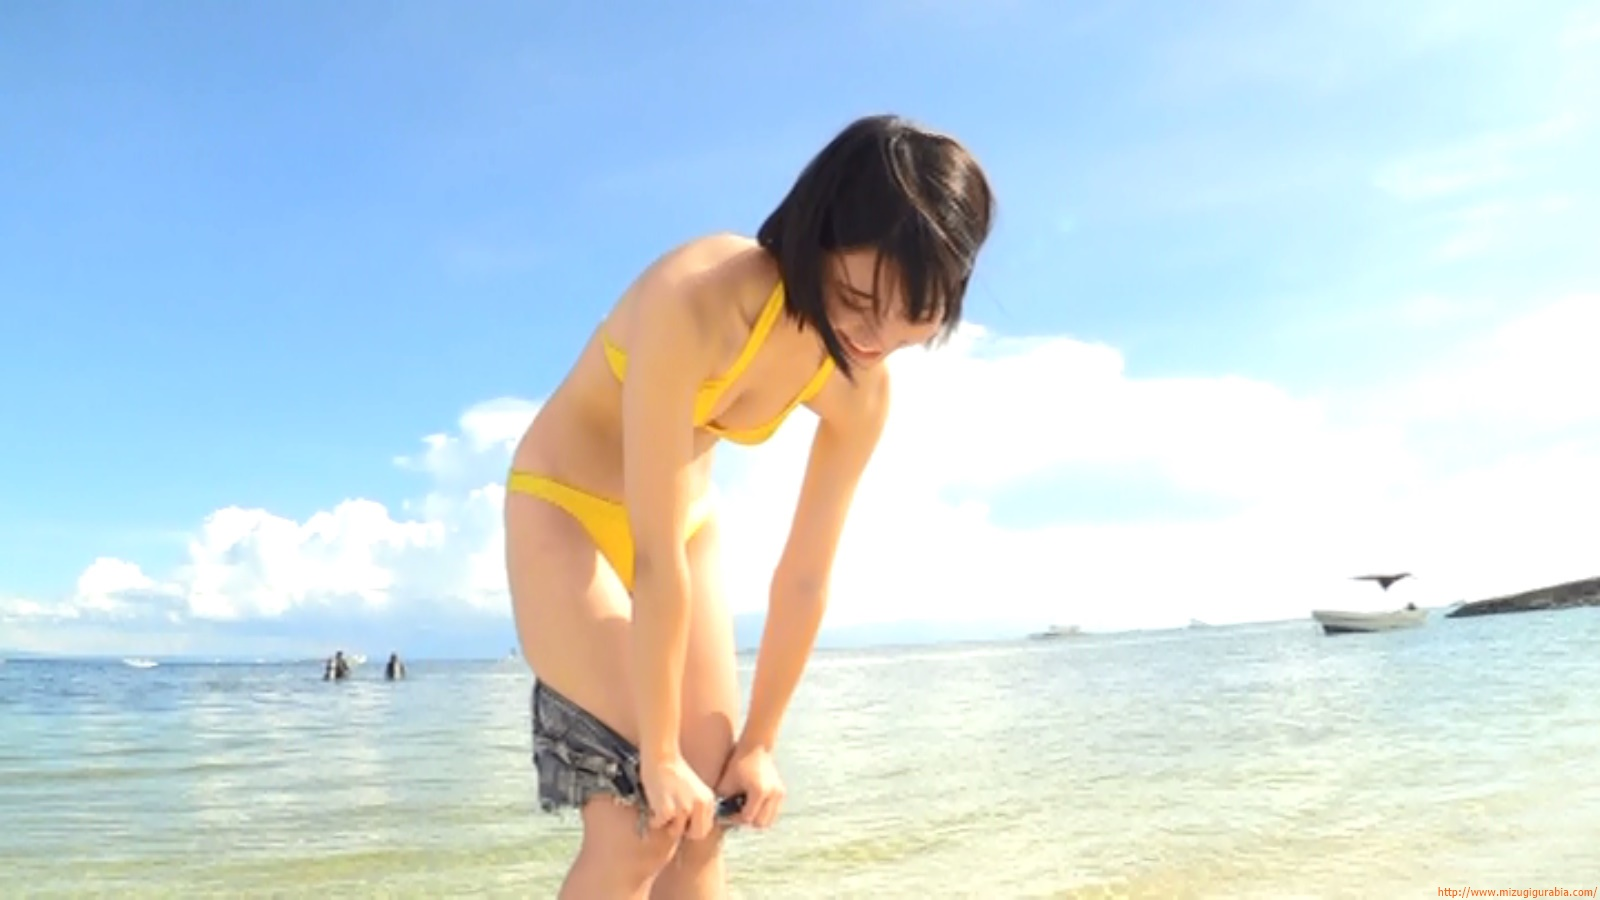 Beach dating125